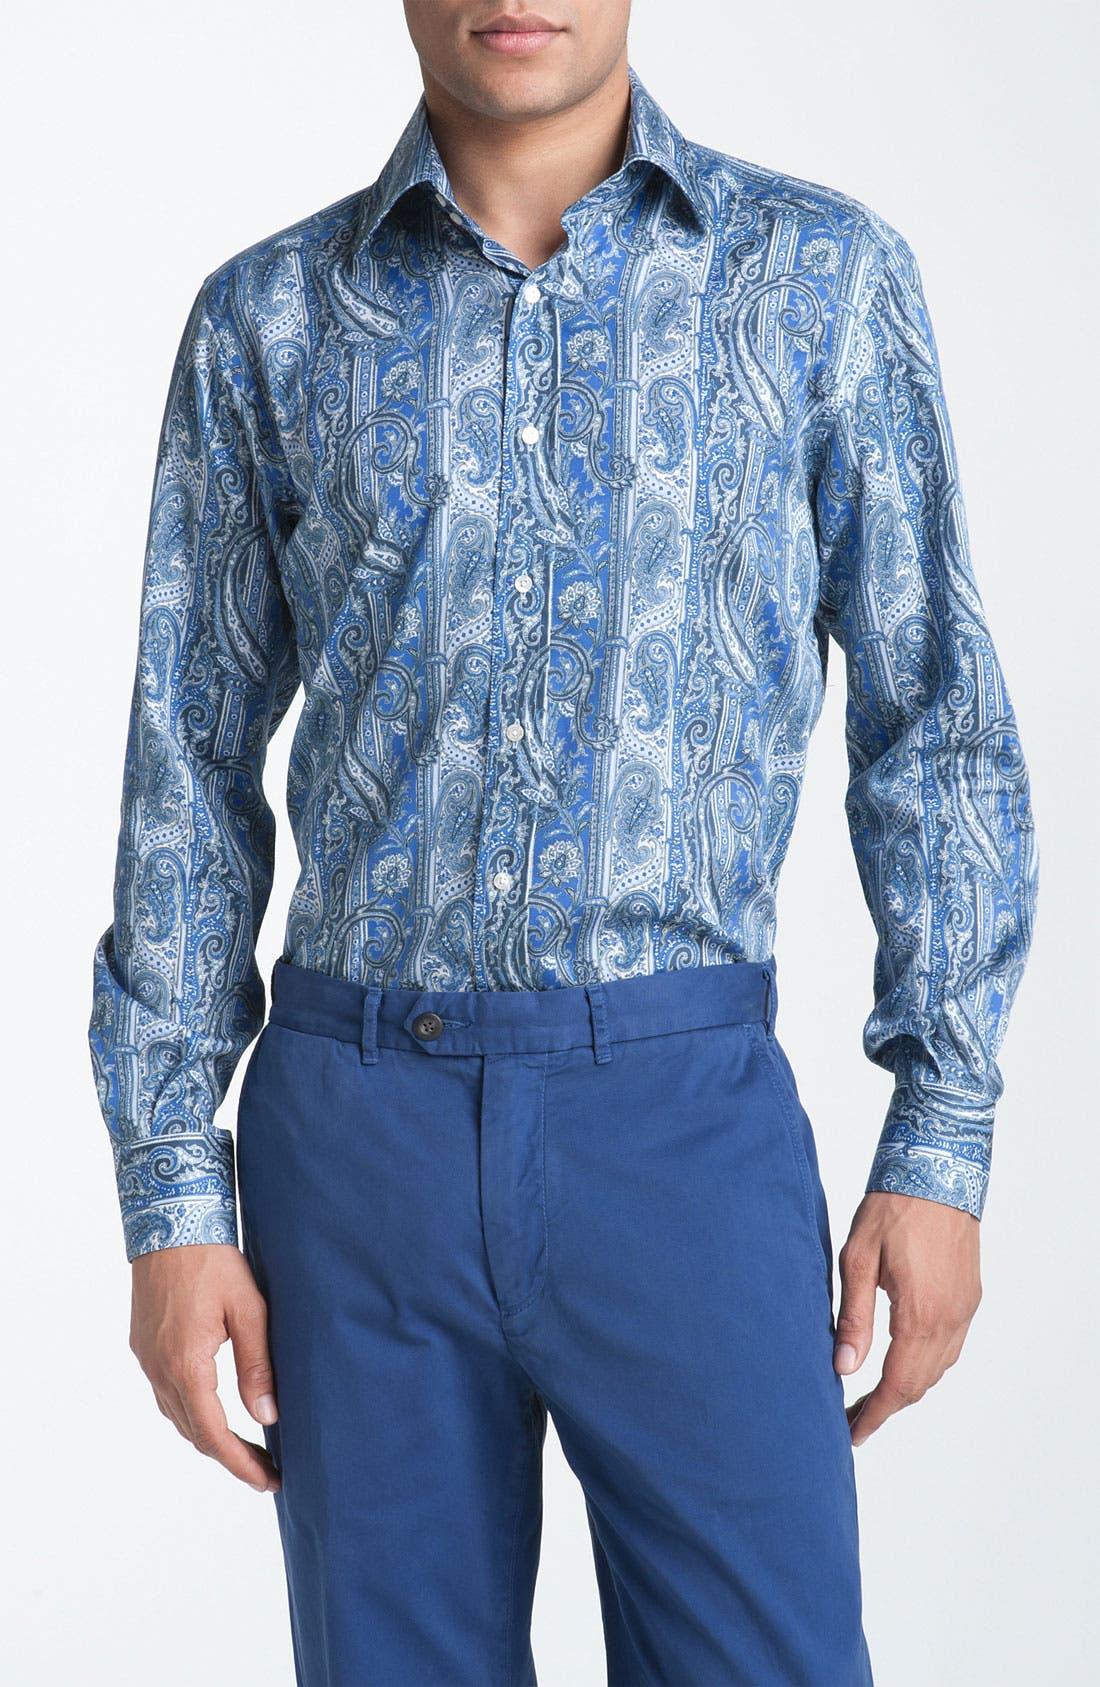 Main Image - Etro Paisley Woven Dress Shirt